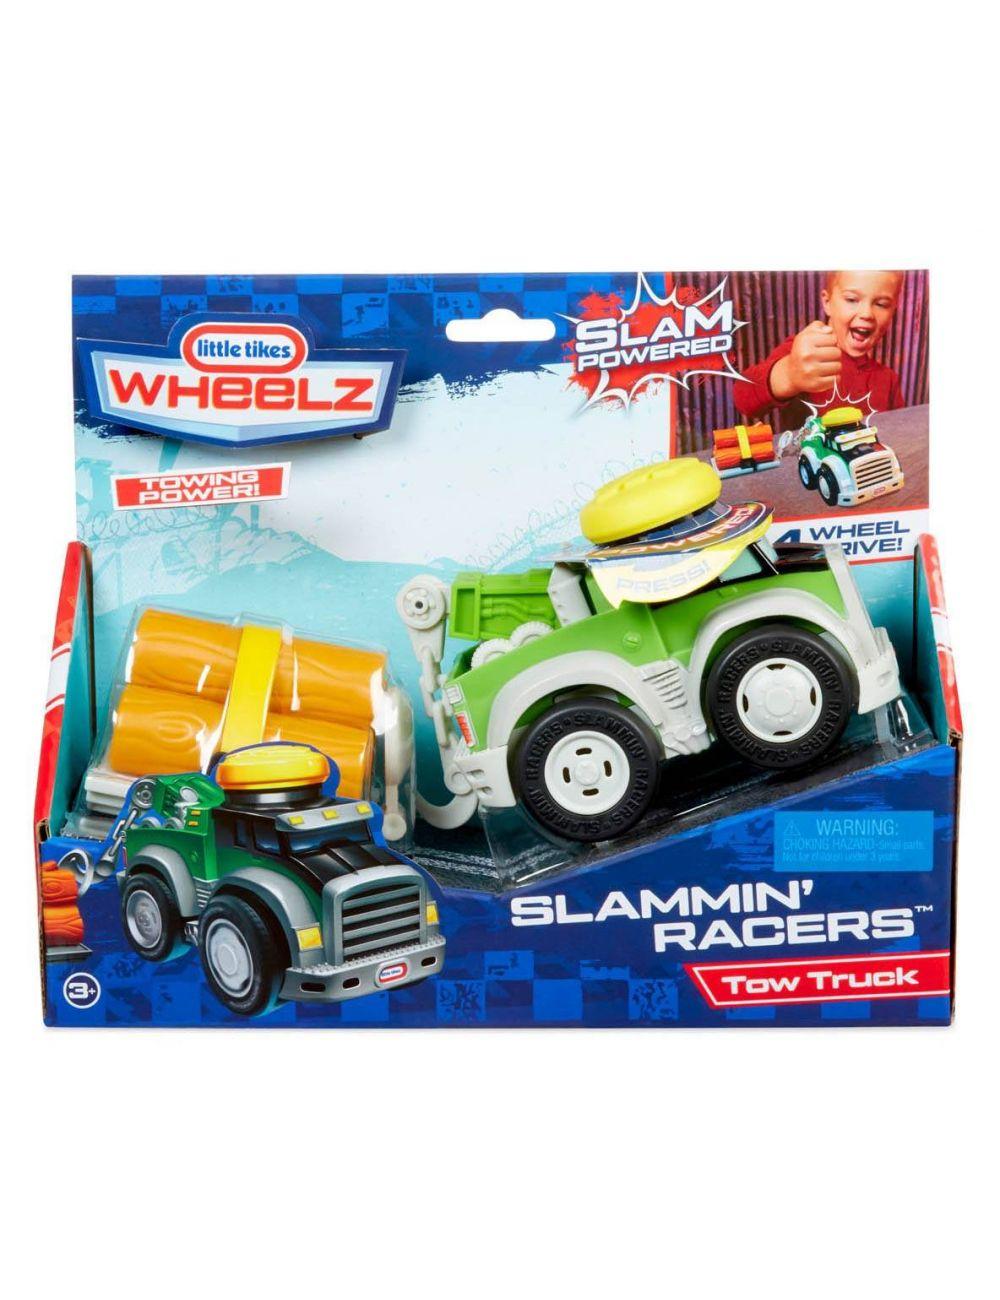 Little Tikes Slammin Racers Tow Truck pudełko